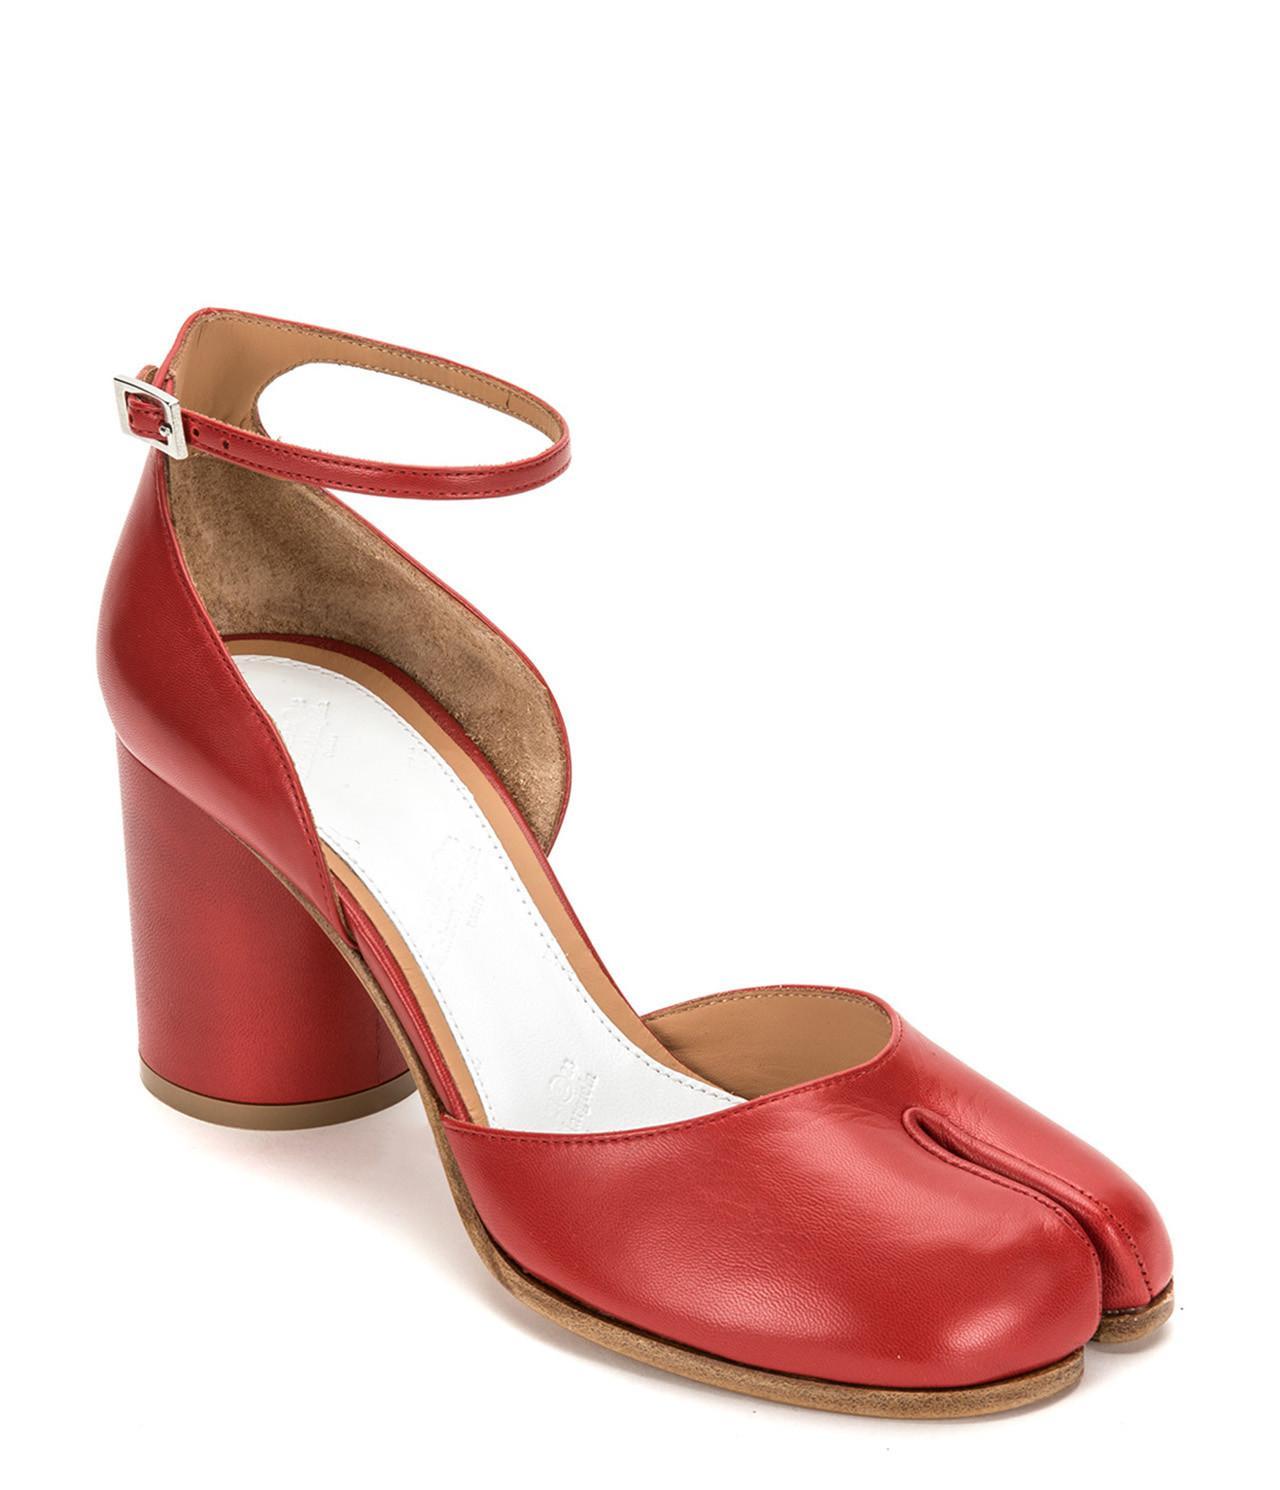 84f27585c2ed Maison Margiela - Red Tabi Leather Ankle-strap Pump - Lyst. View fullscreen